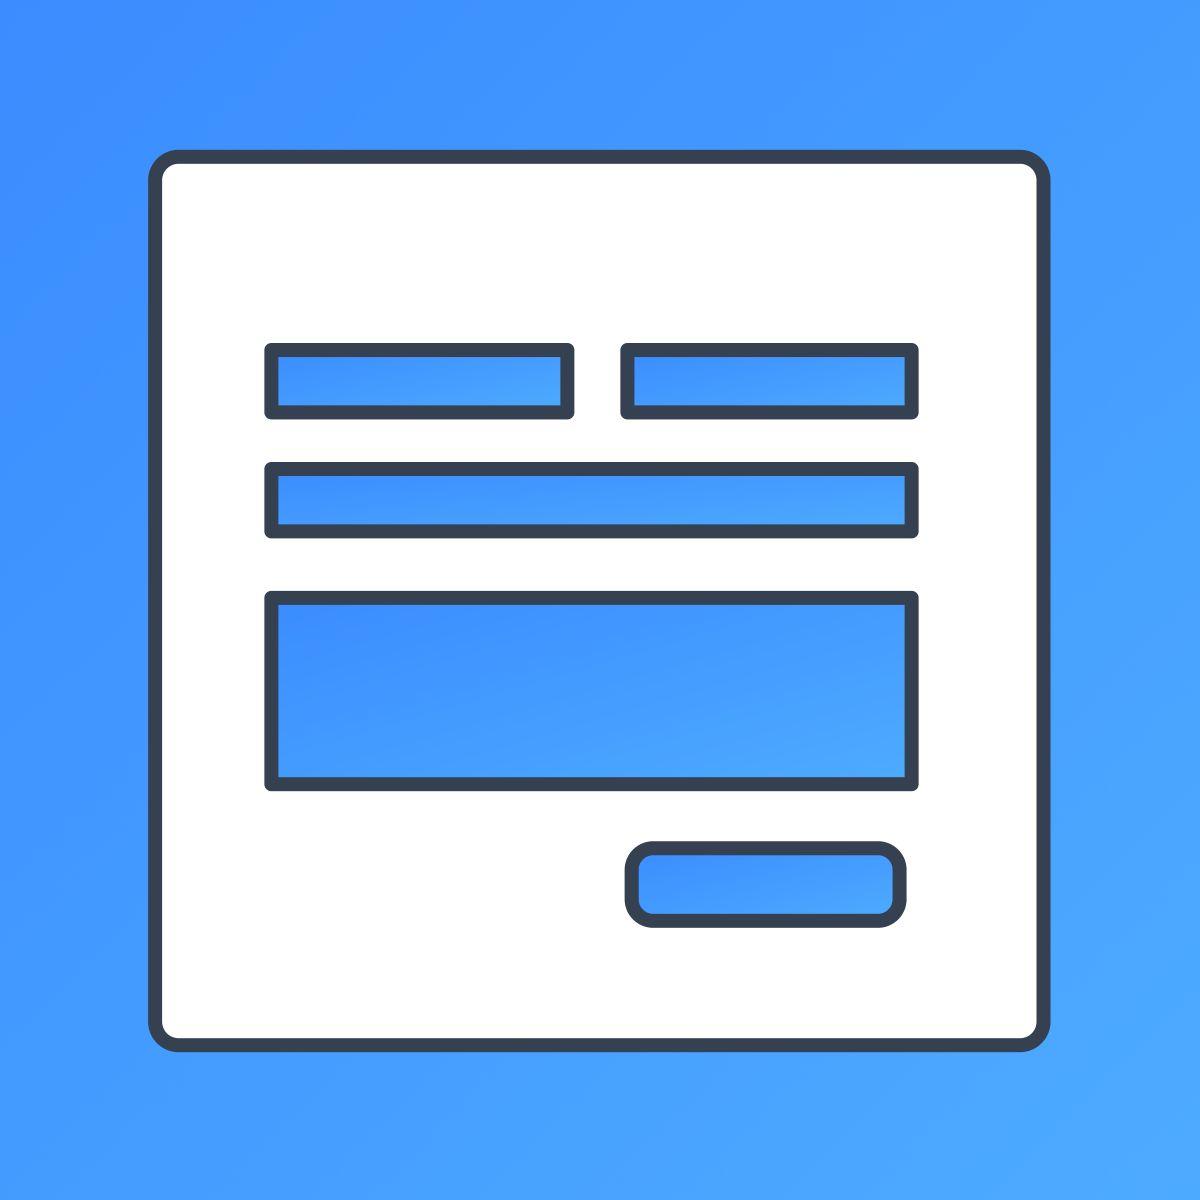 Shopify Form Builder app by Powr.io